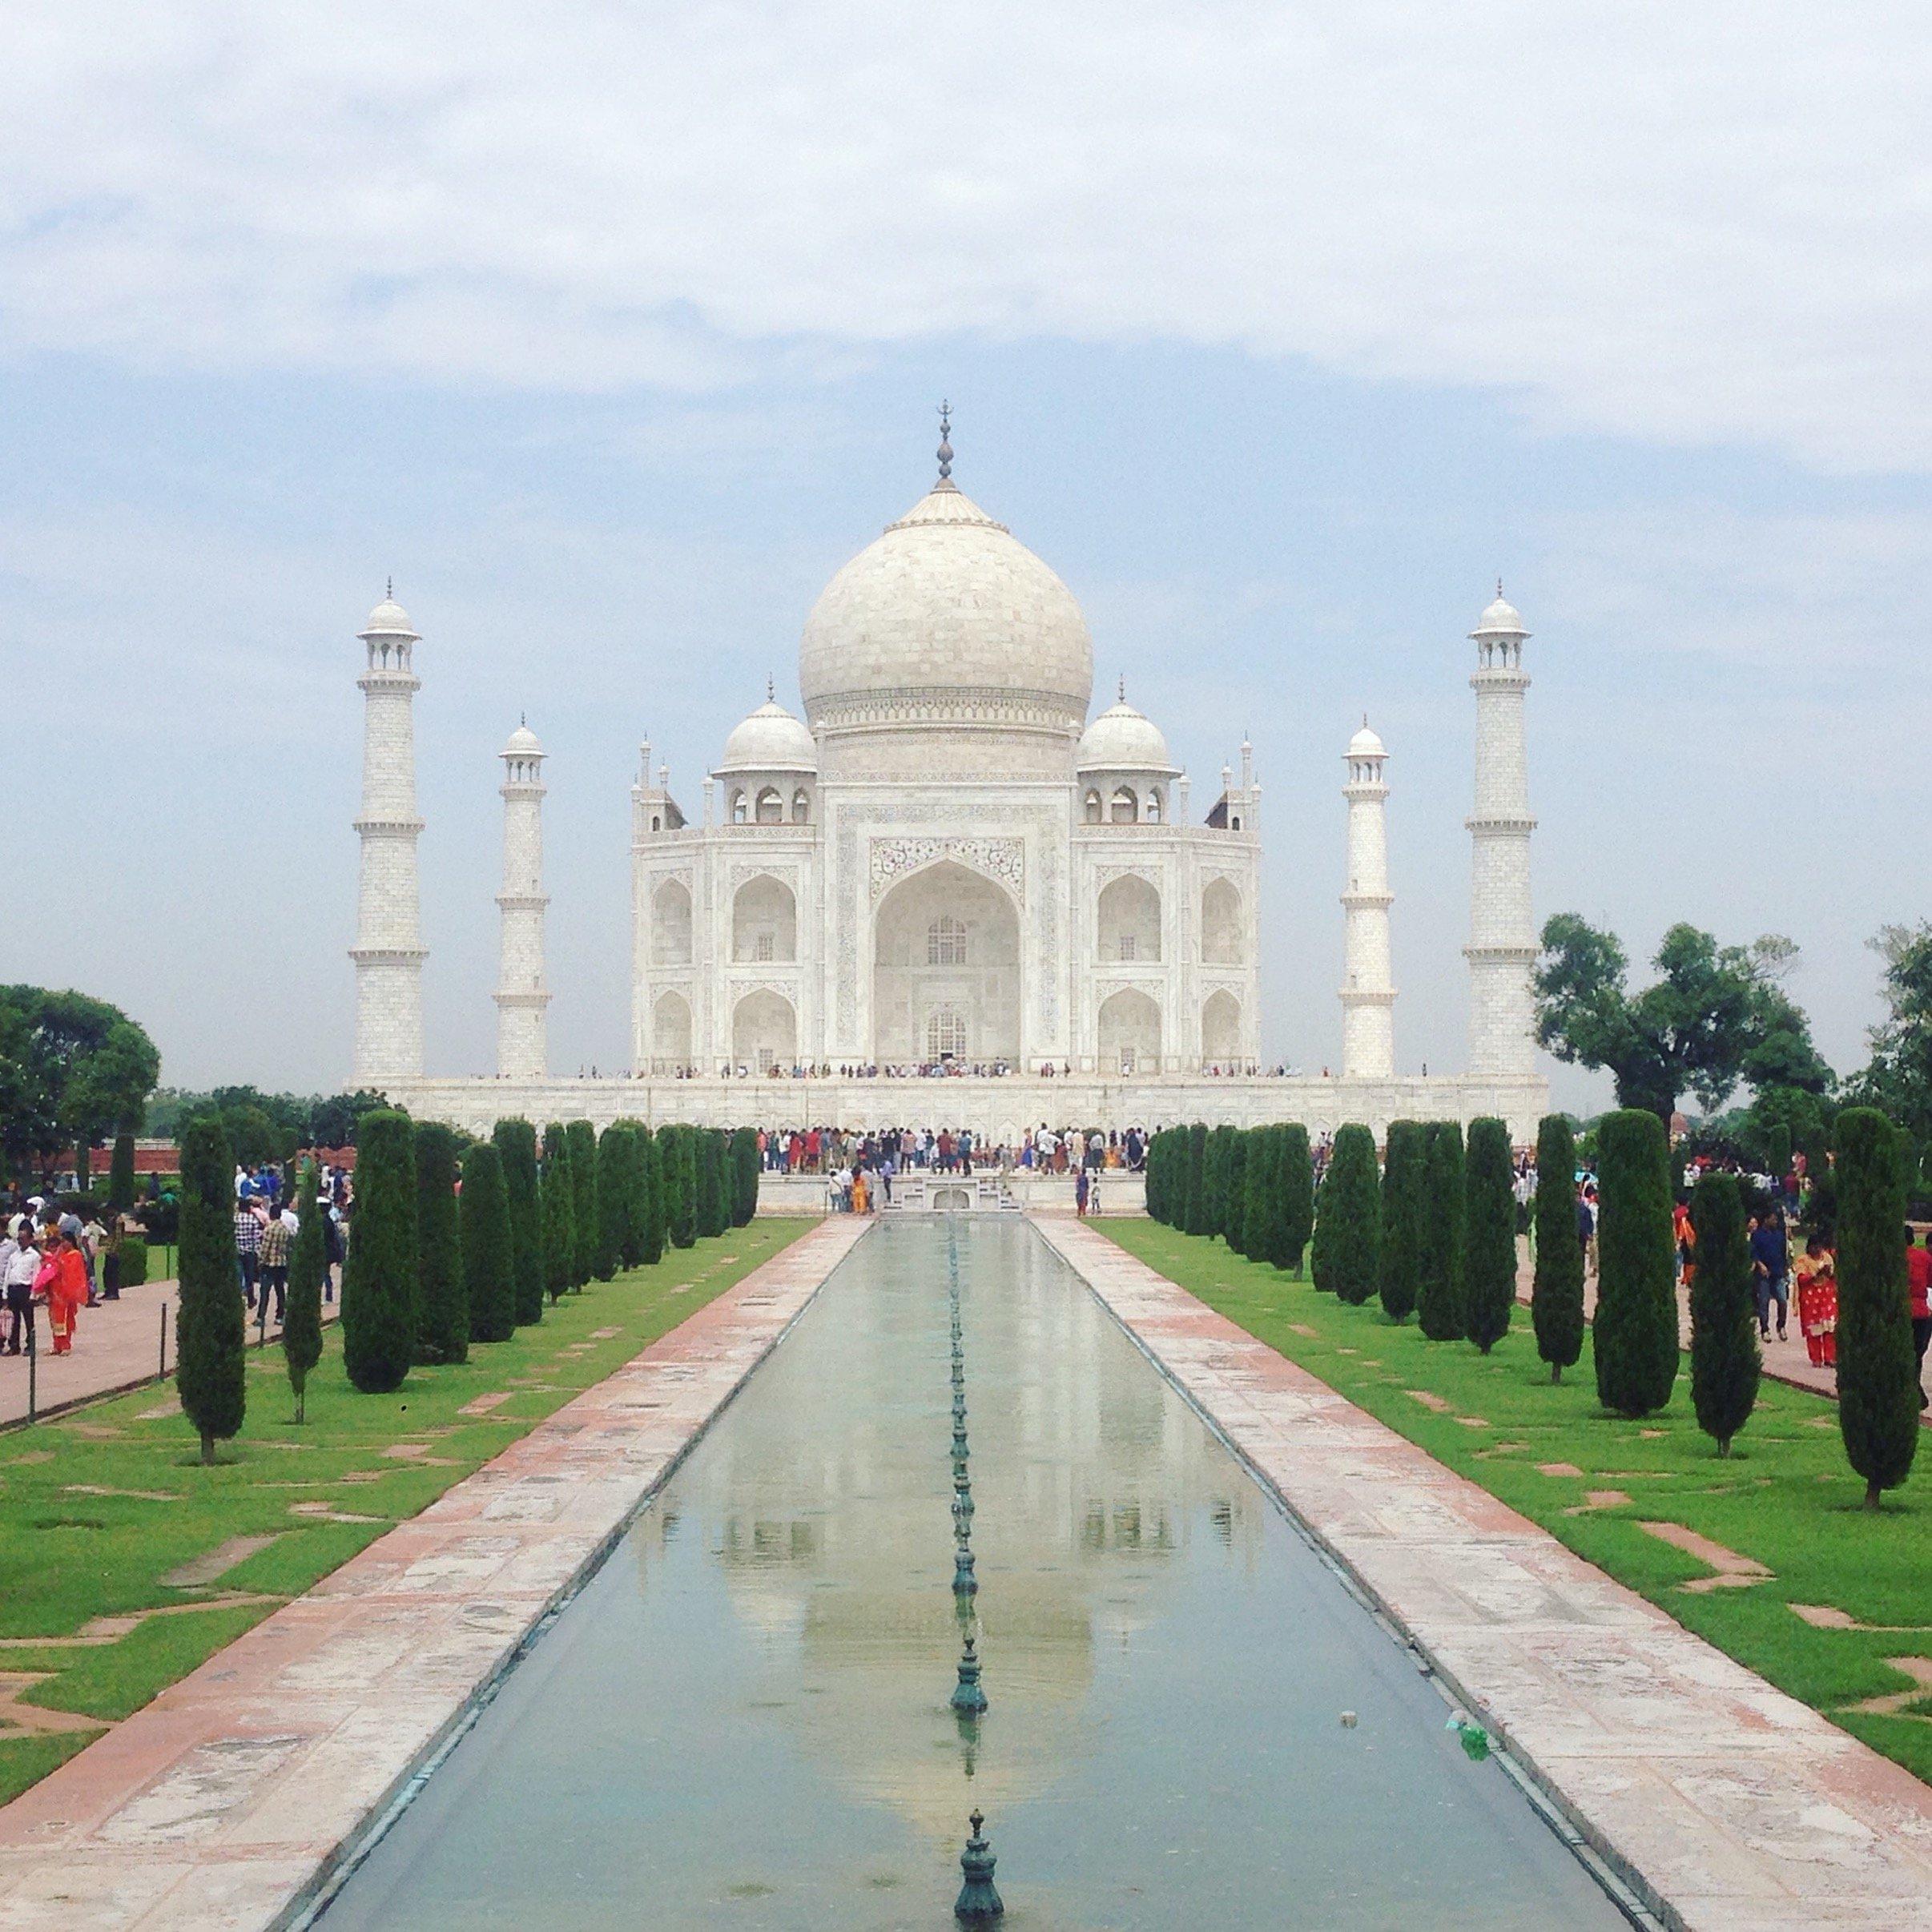 Vue du Taj Mahal